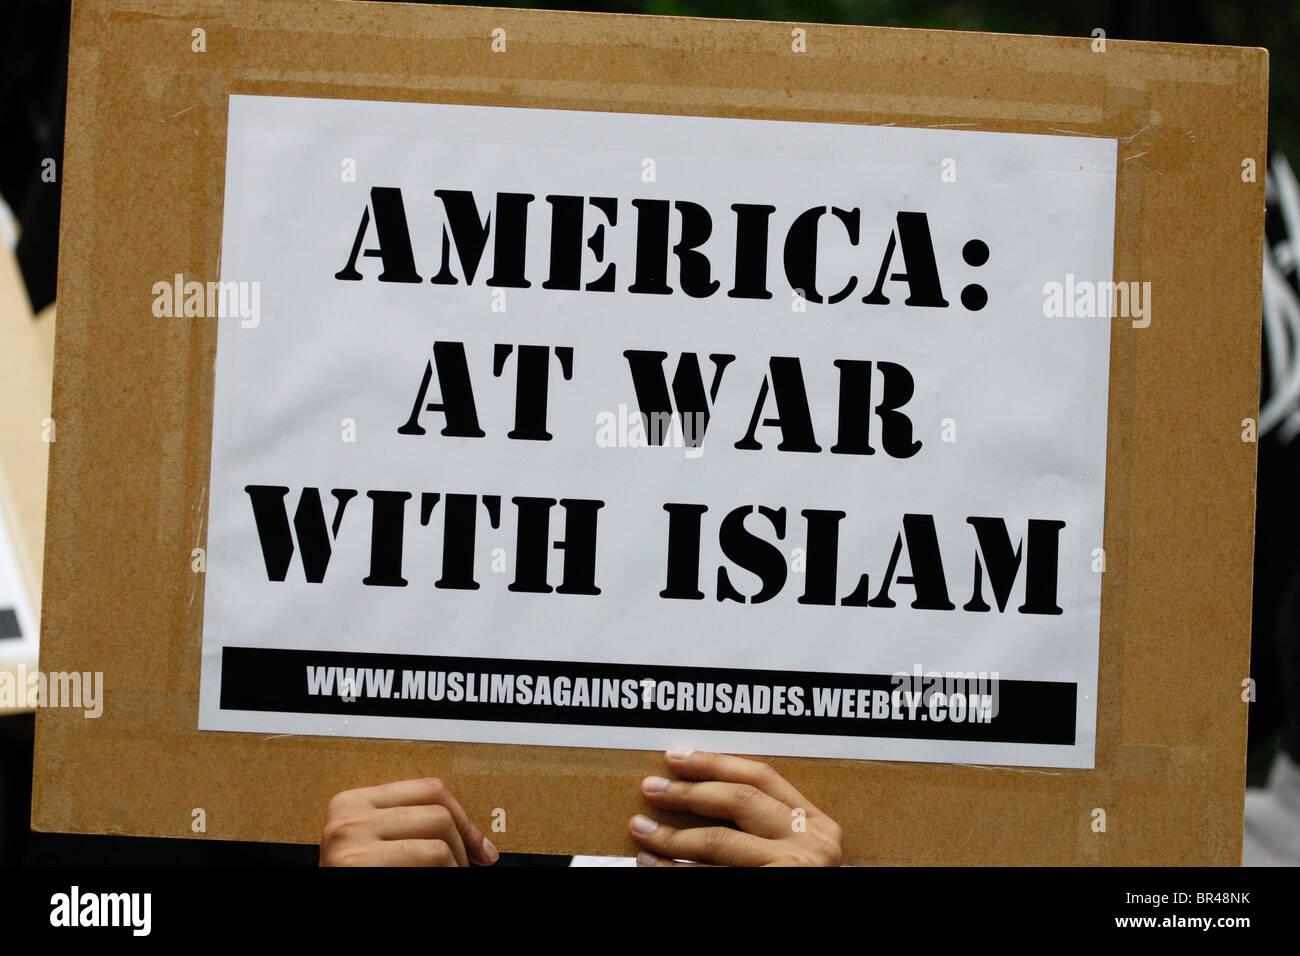 Radical Muslims Stock Photos & Radical Muslims Stock Images - Alamy